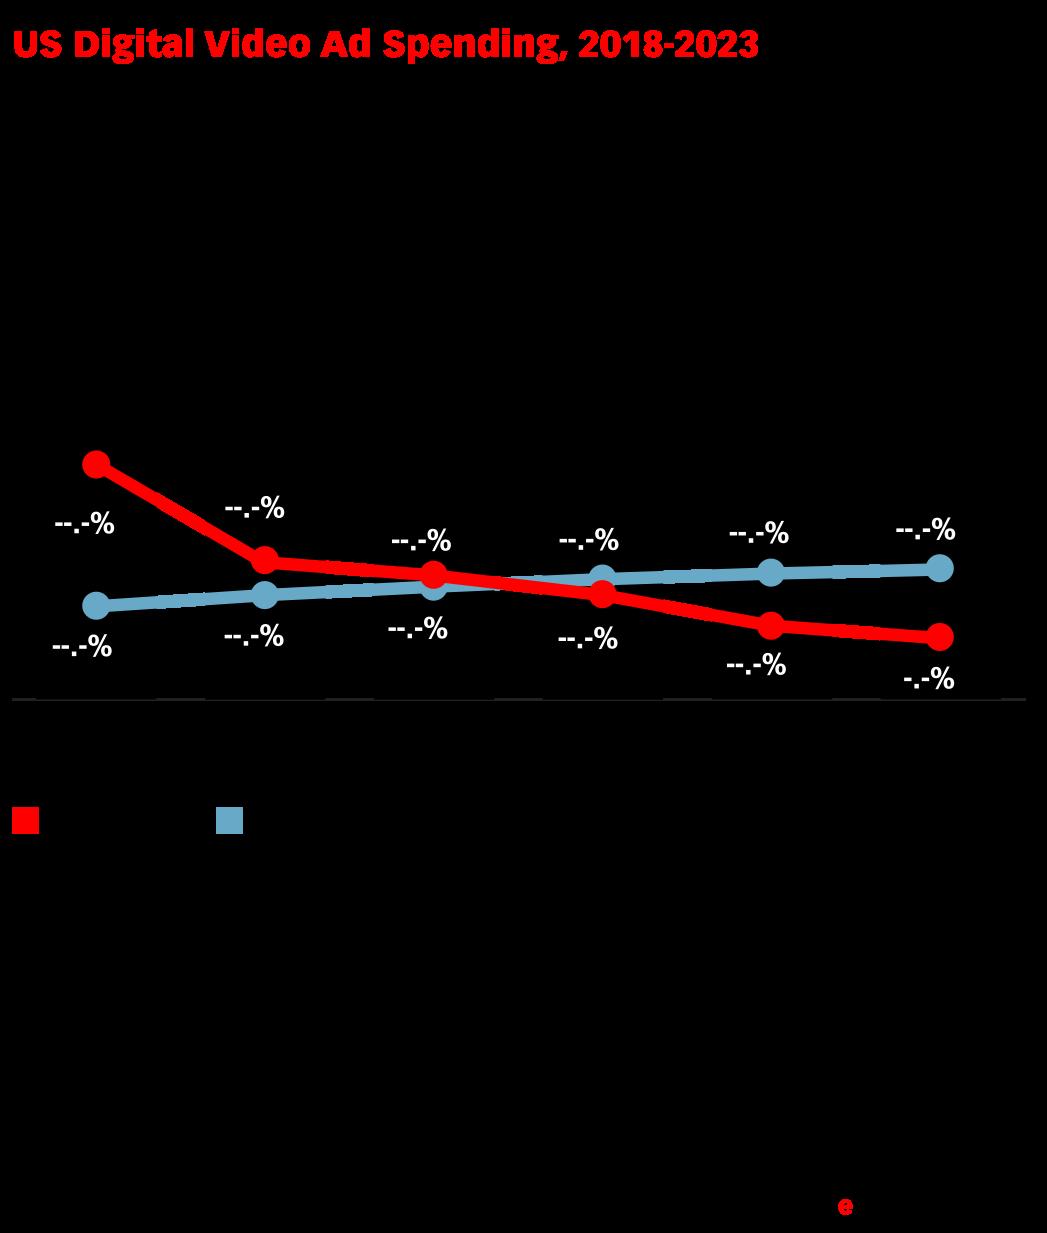 US Digital Video Ad Spending, 2018-2023 (billions, % change and % of total media ad spending)